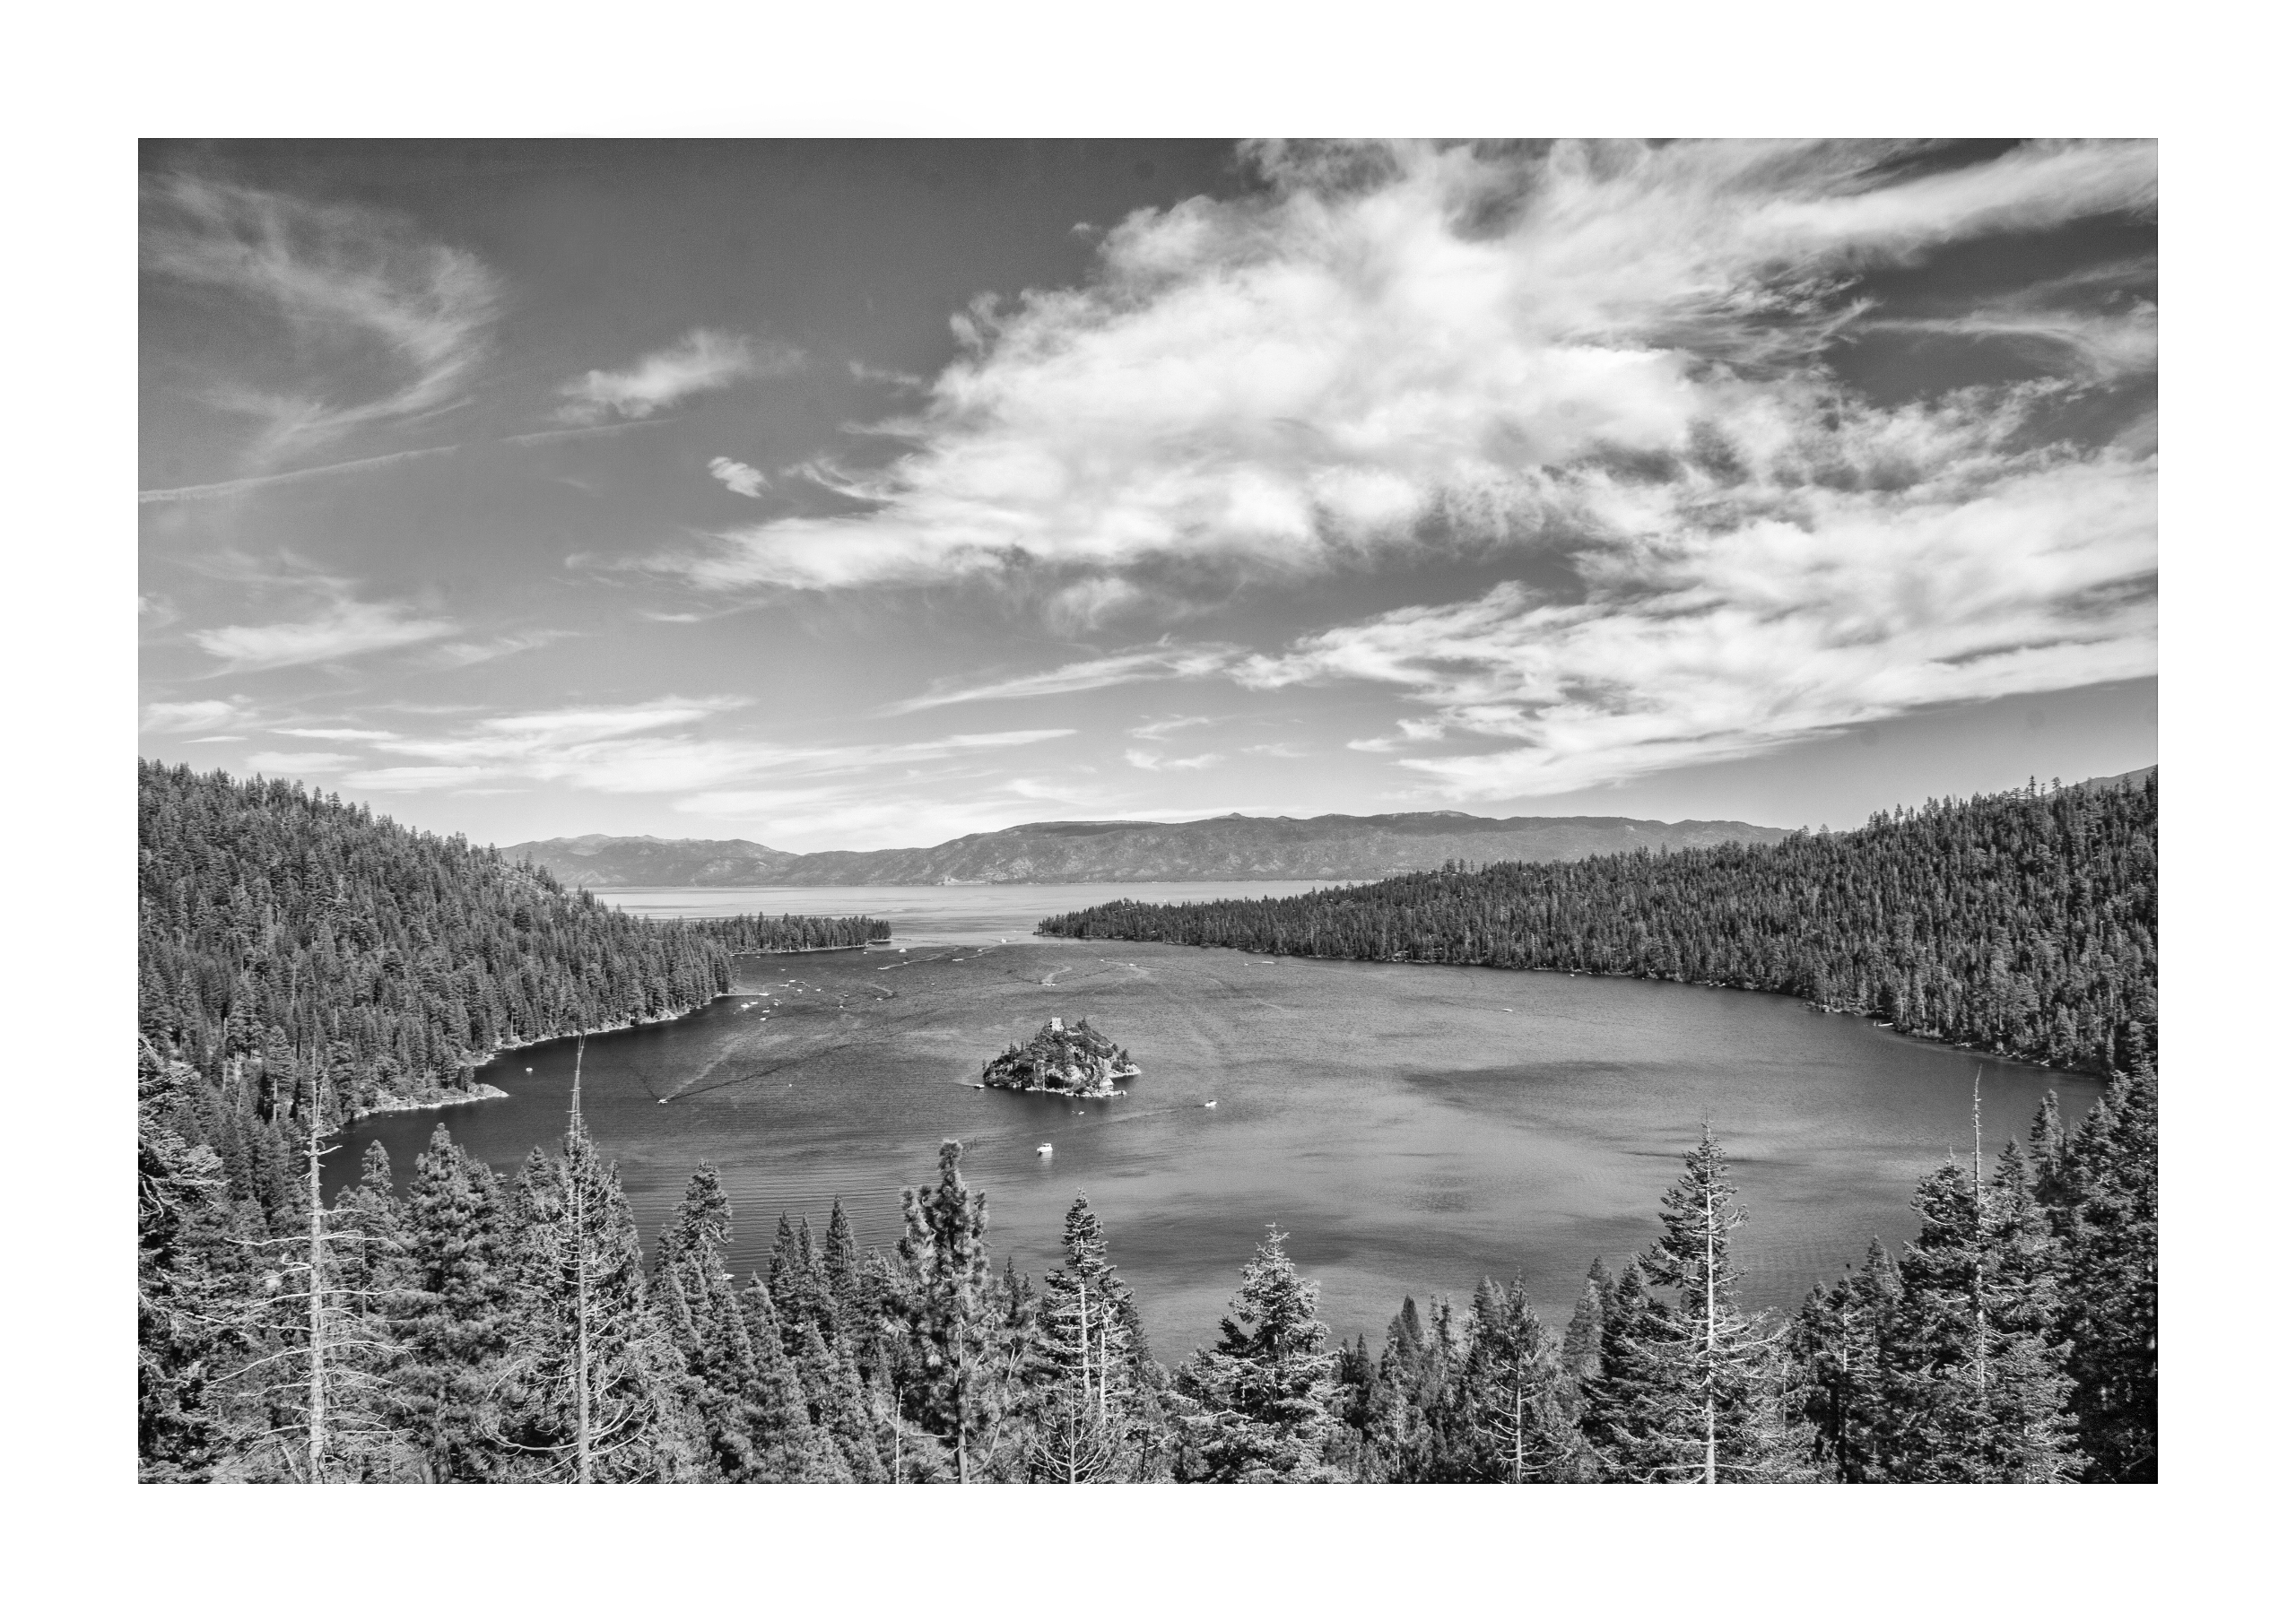 Esmerald Bay, Lake Tahoe, CA - guillermoalvarez   ello